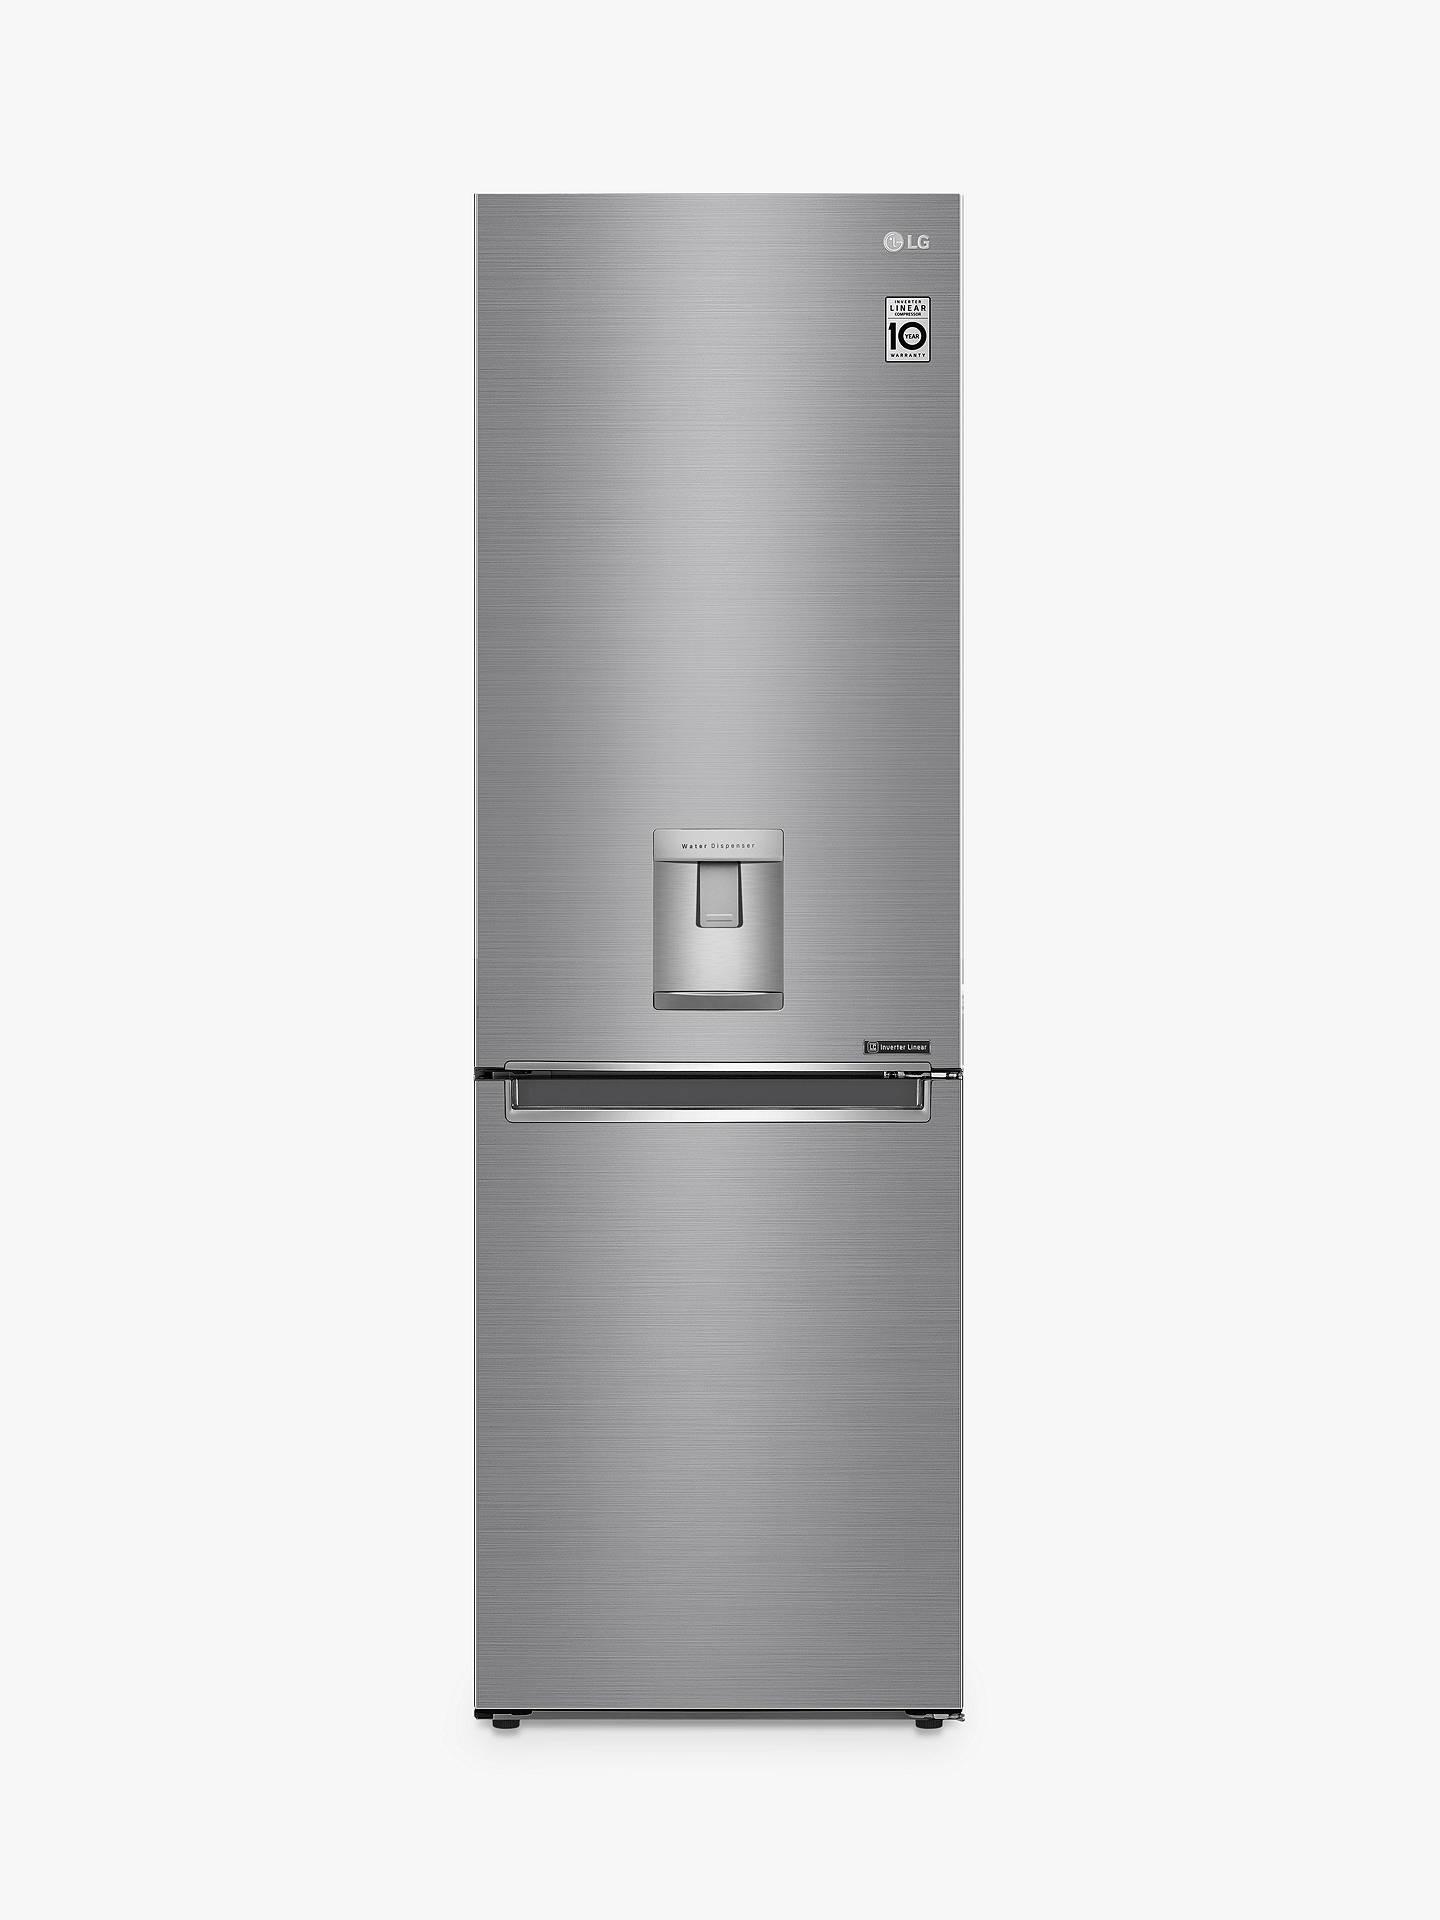 64b1dfc0 Buy LG GBF61PZJZN Fridge Freezer, A++ Energy Rating, 60cm Wide, Shiny Steel  Online ...